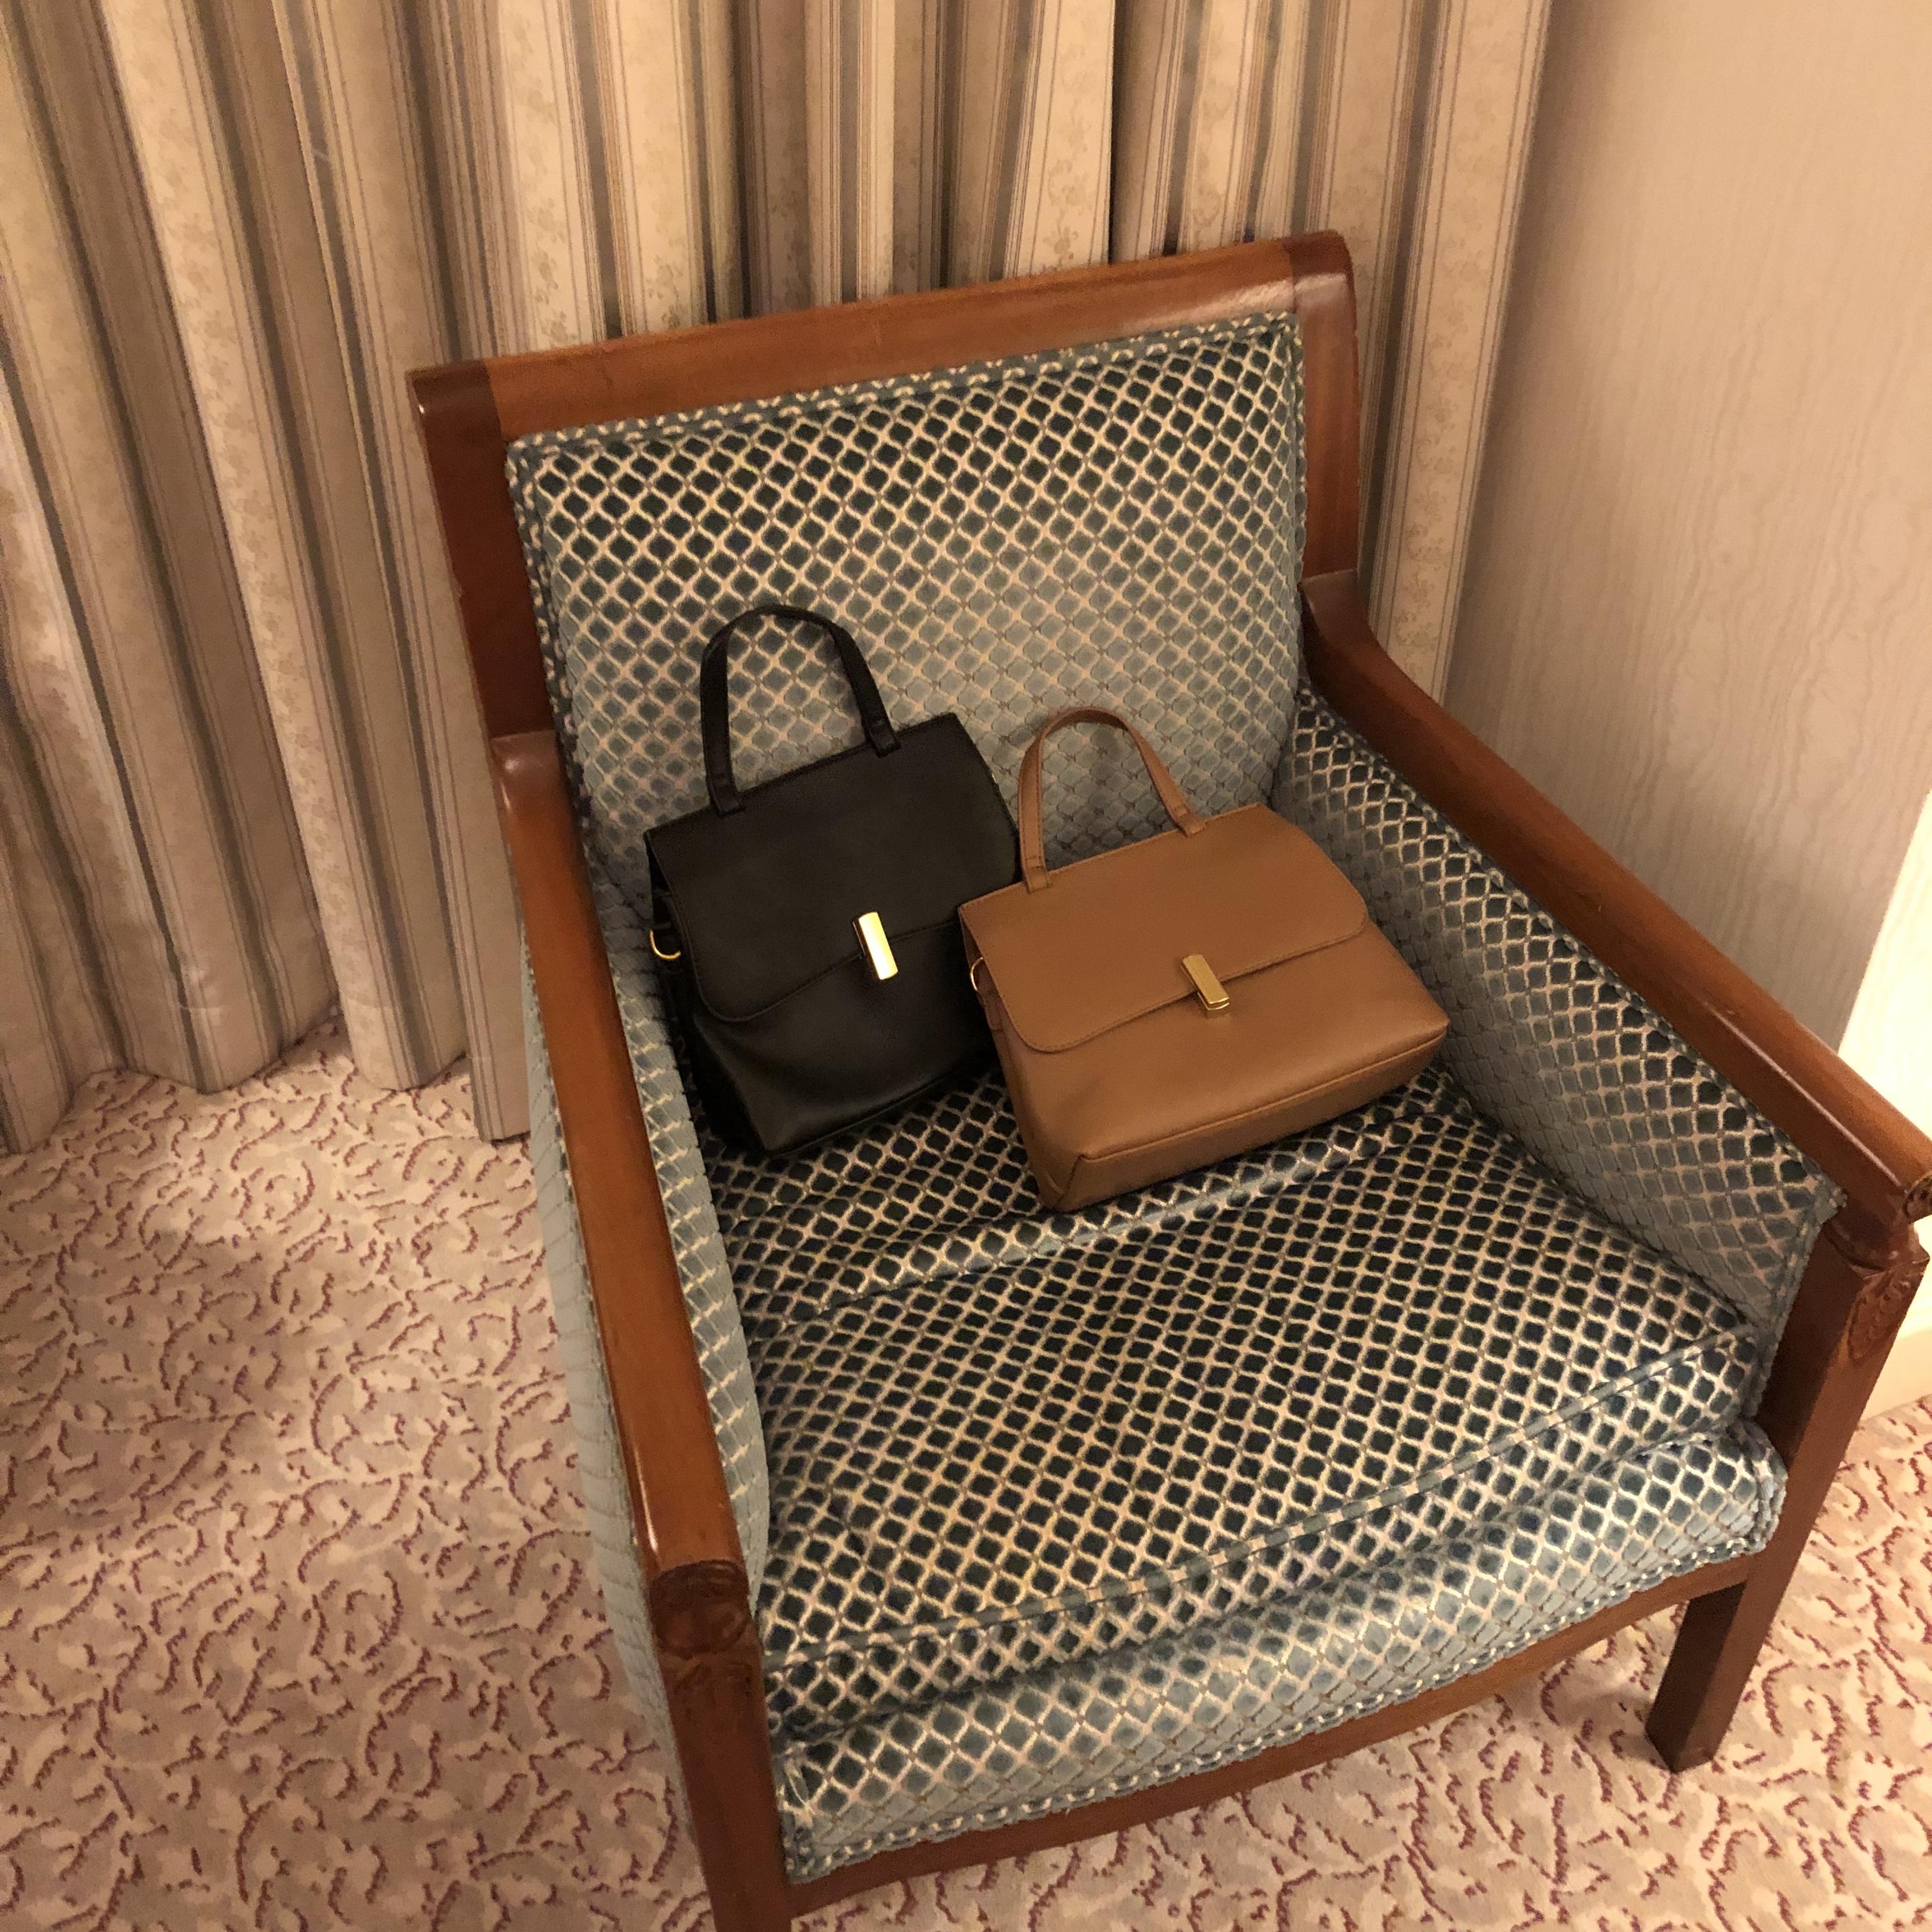 fake leather handbag